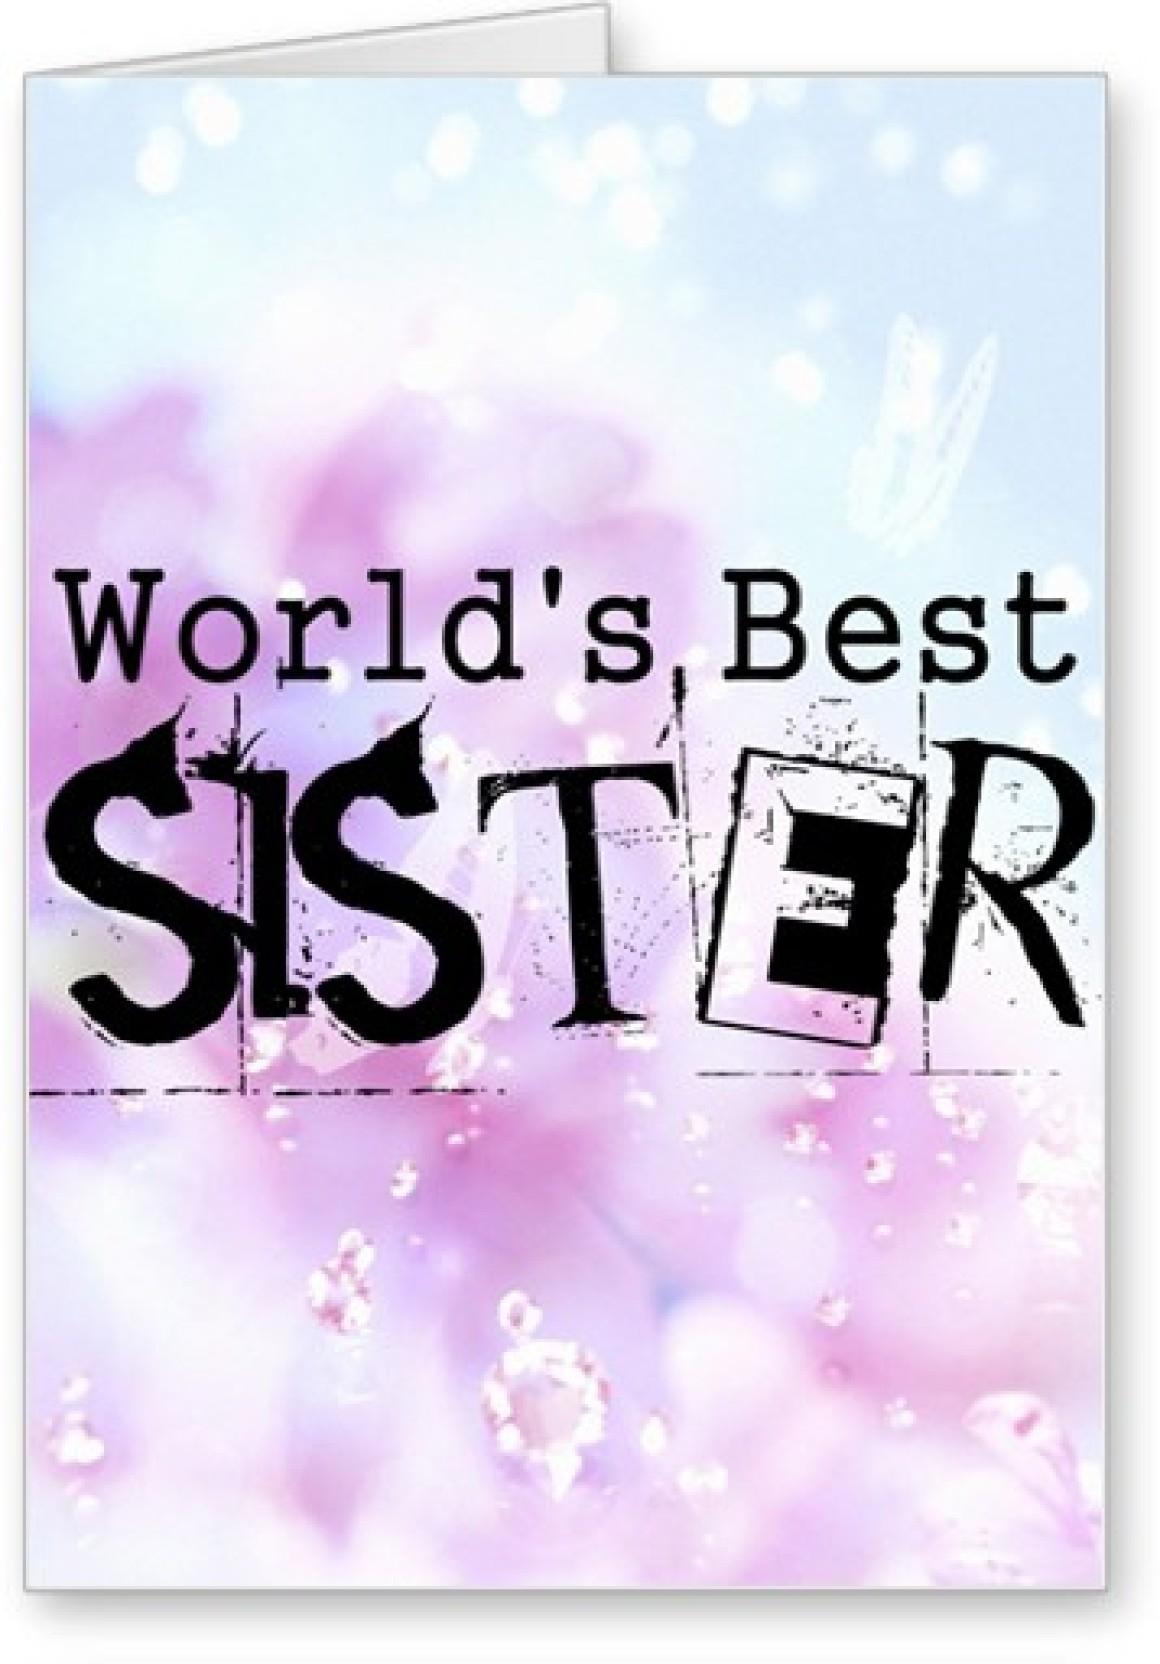 Lolprint Worlds Best Sister Rakhi Greeting Card Price In India